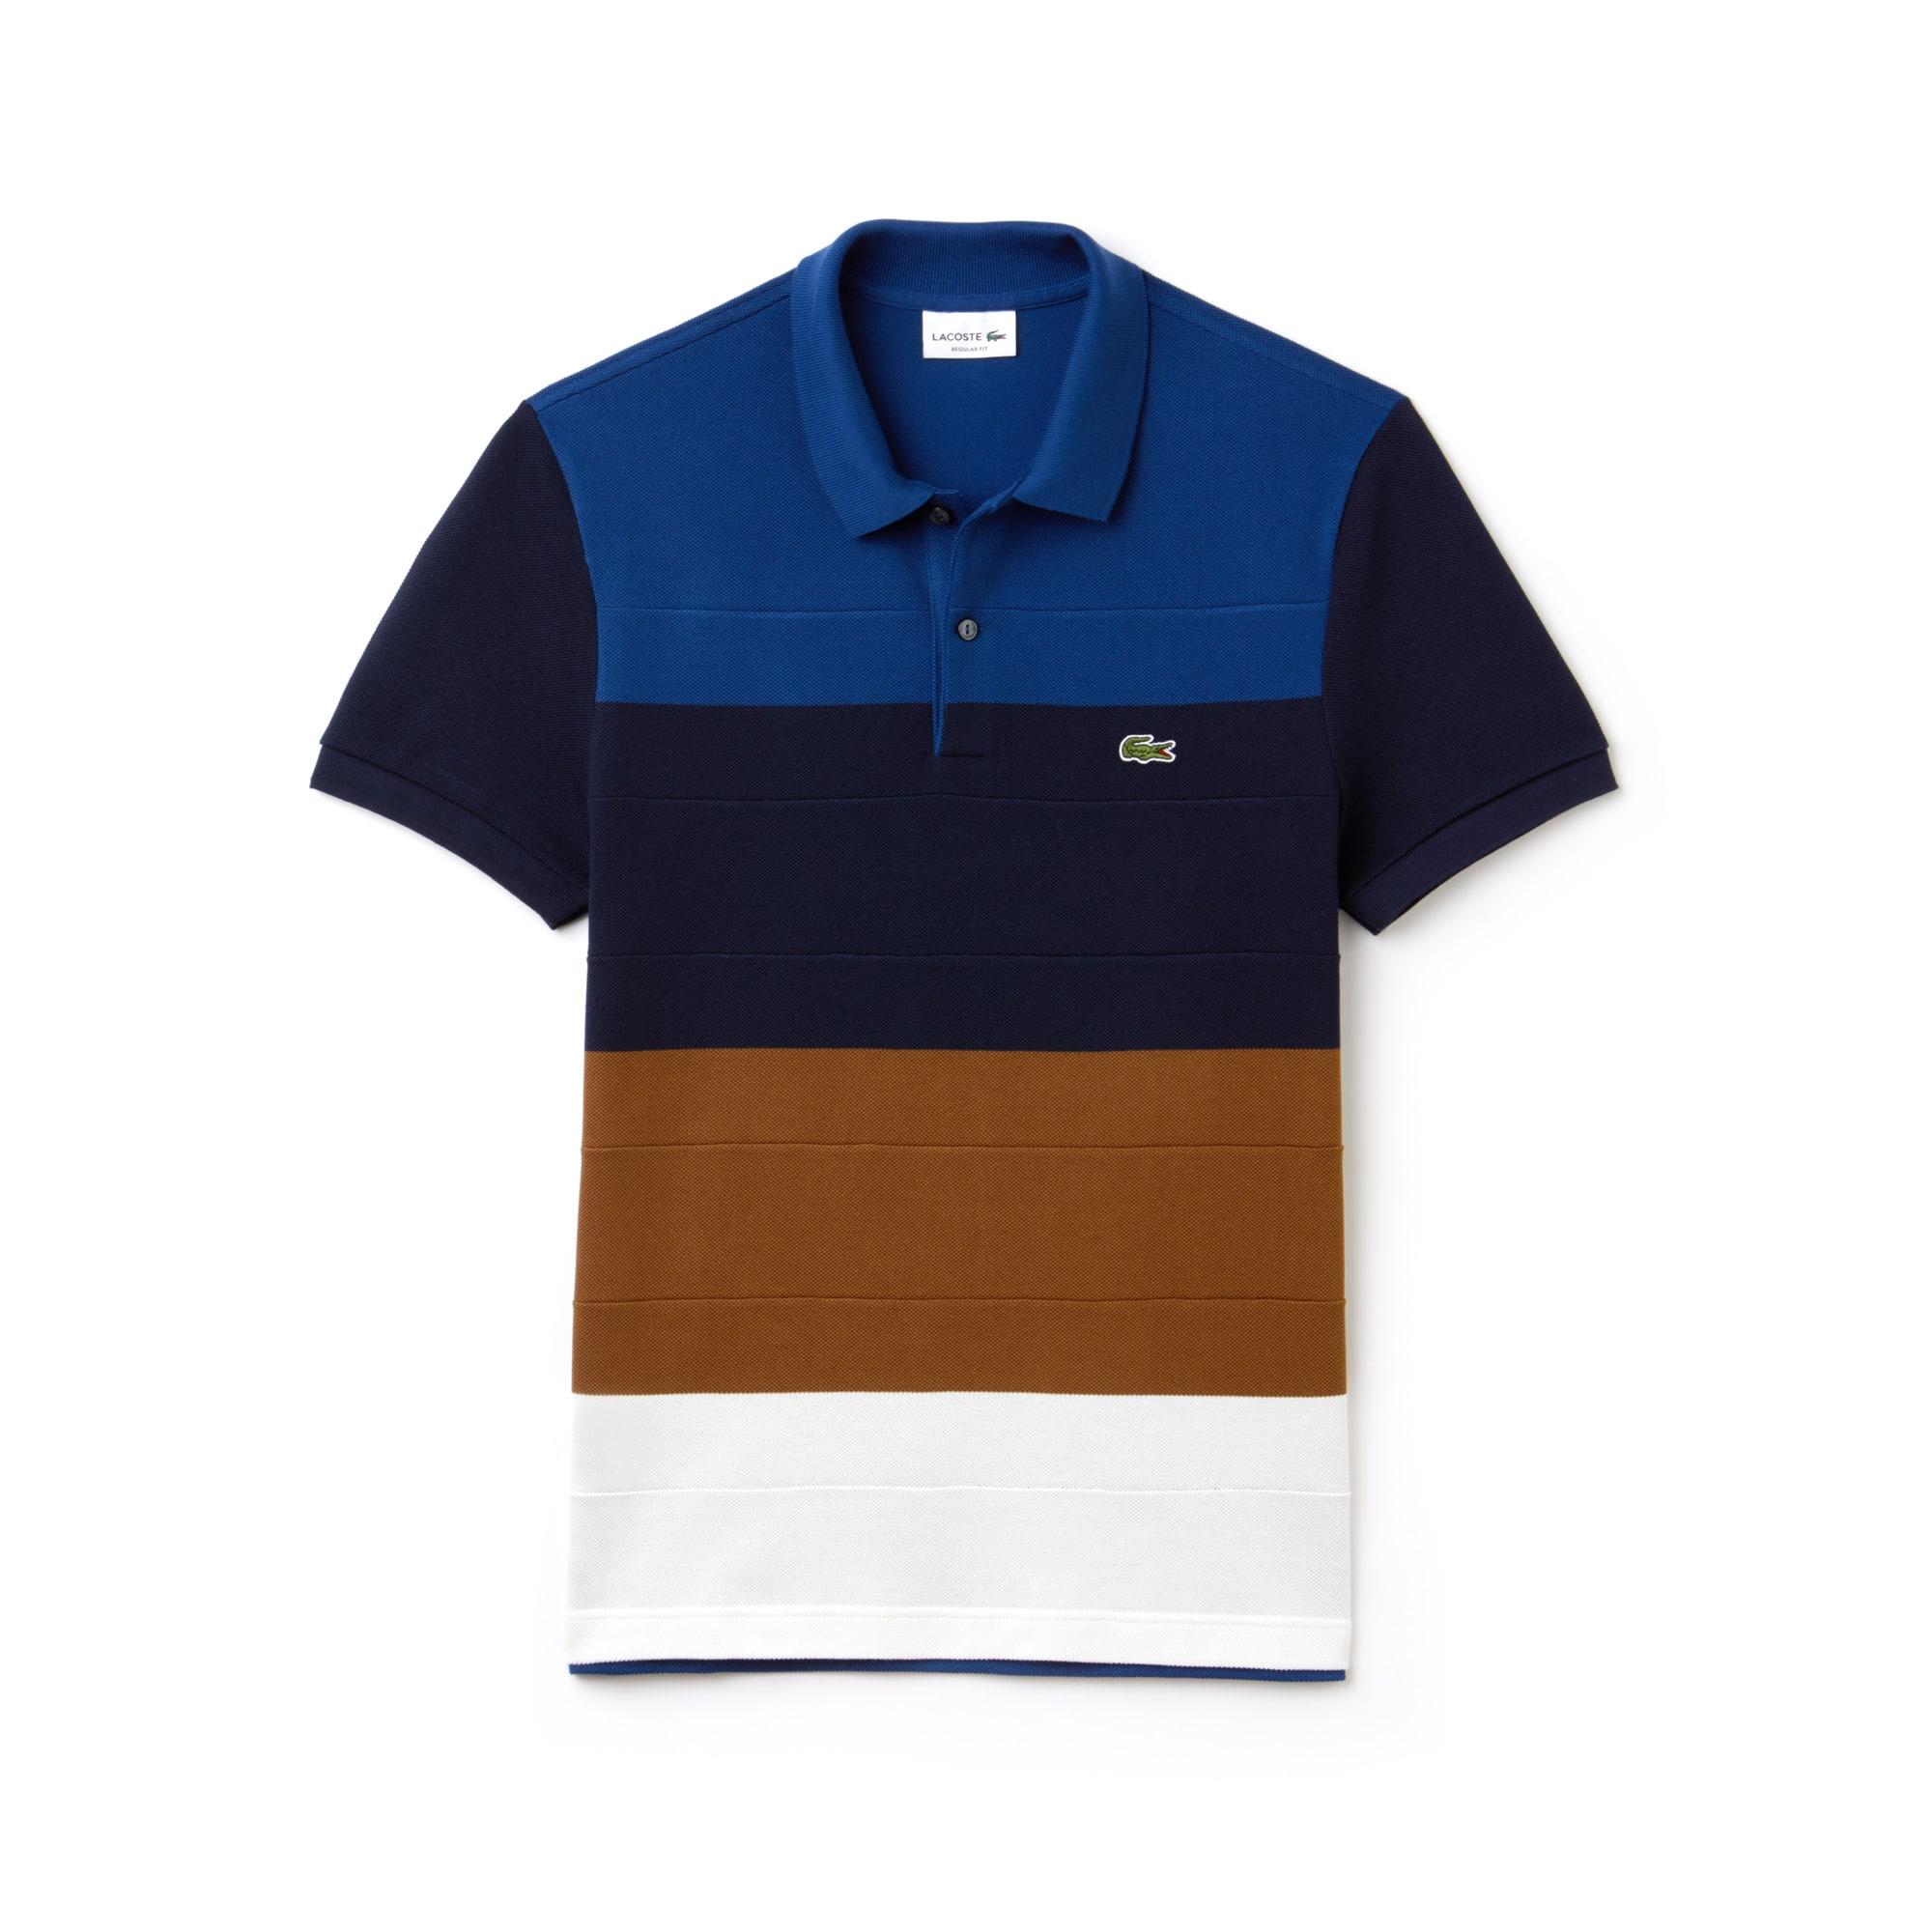 Regular Fit Herren-Poloshirt aus Baumwoll-Piqué mit Colorblock LACOSTE